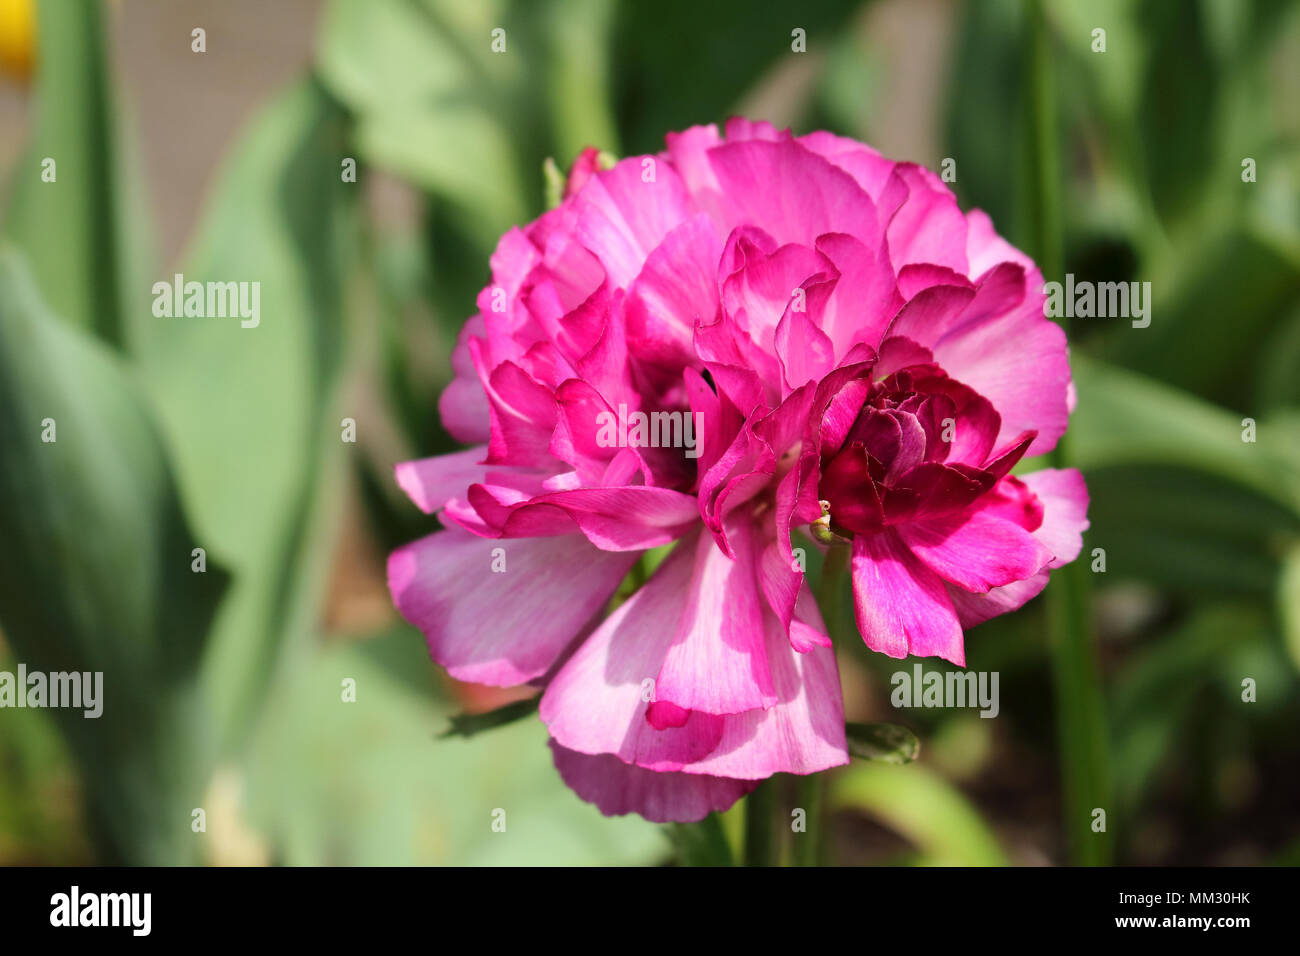 Rose Rose Fleur Nature Contexte Floral Roses Jardin Beaute